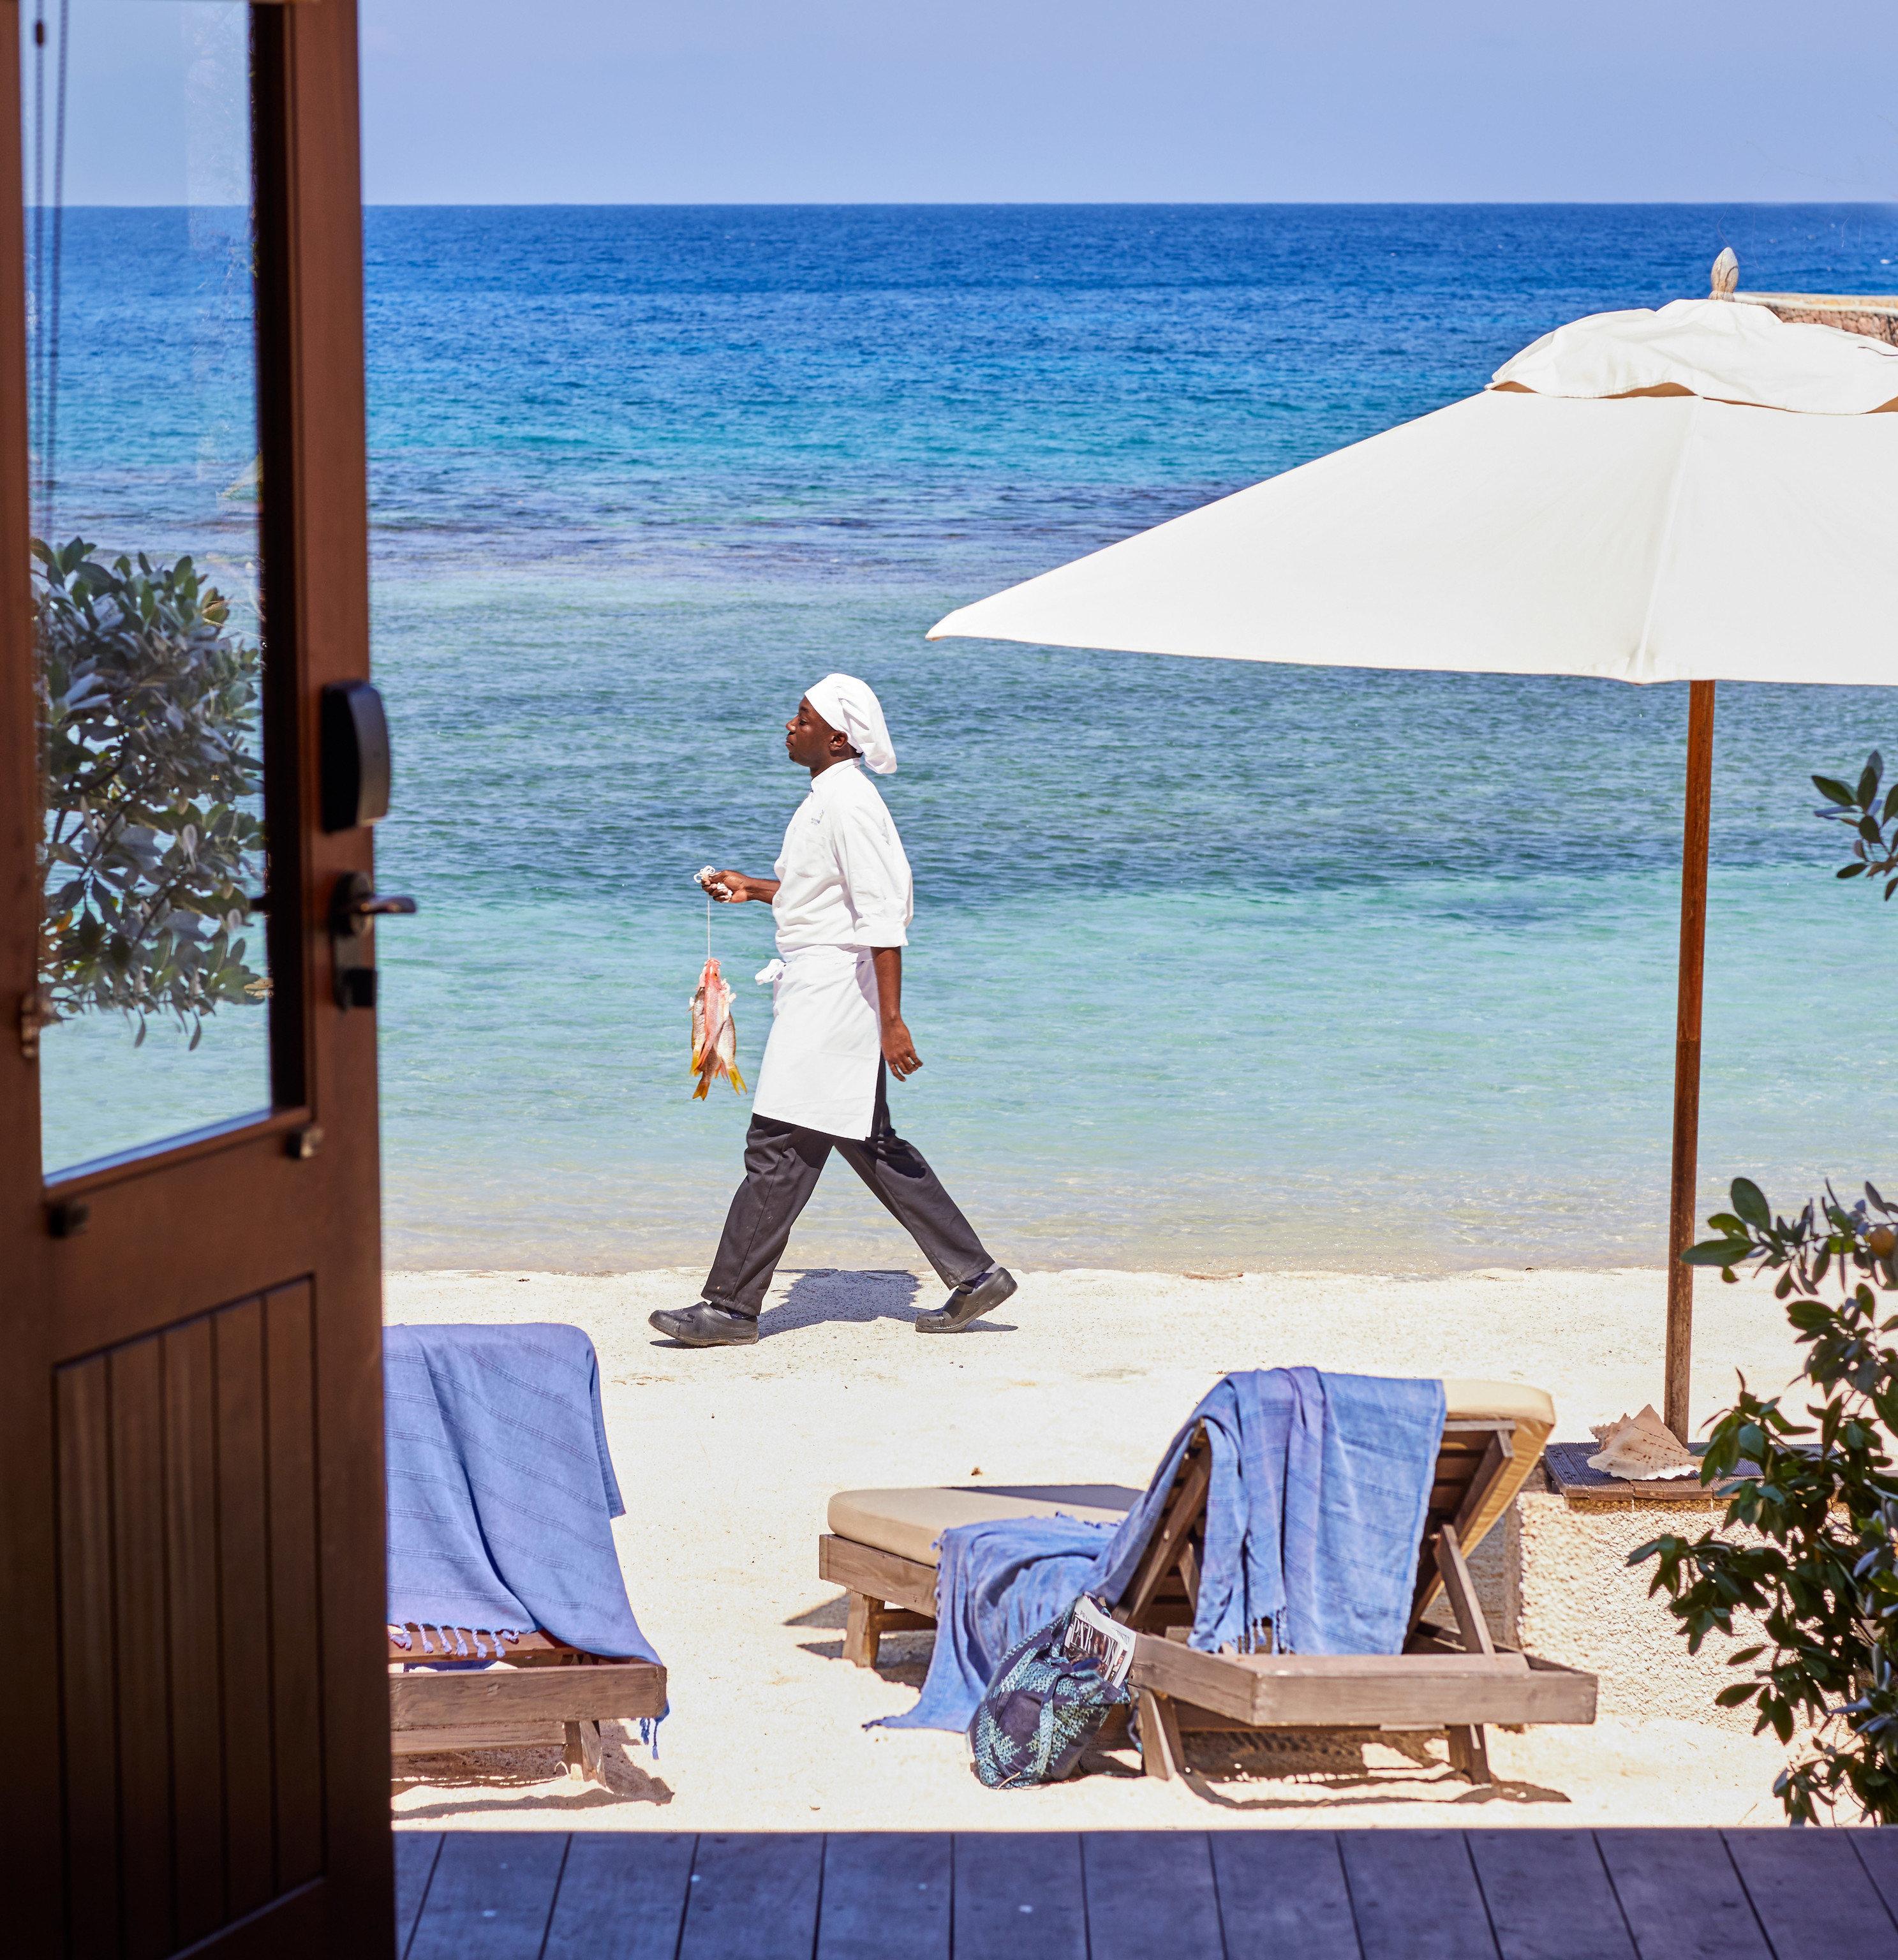 sky water Sea Beach leisure Ocean summer Honeymoon fun sunlounger outdoor furniture swimming pool Resort caribbean recreation shore